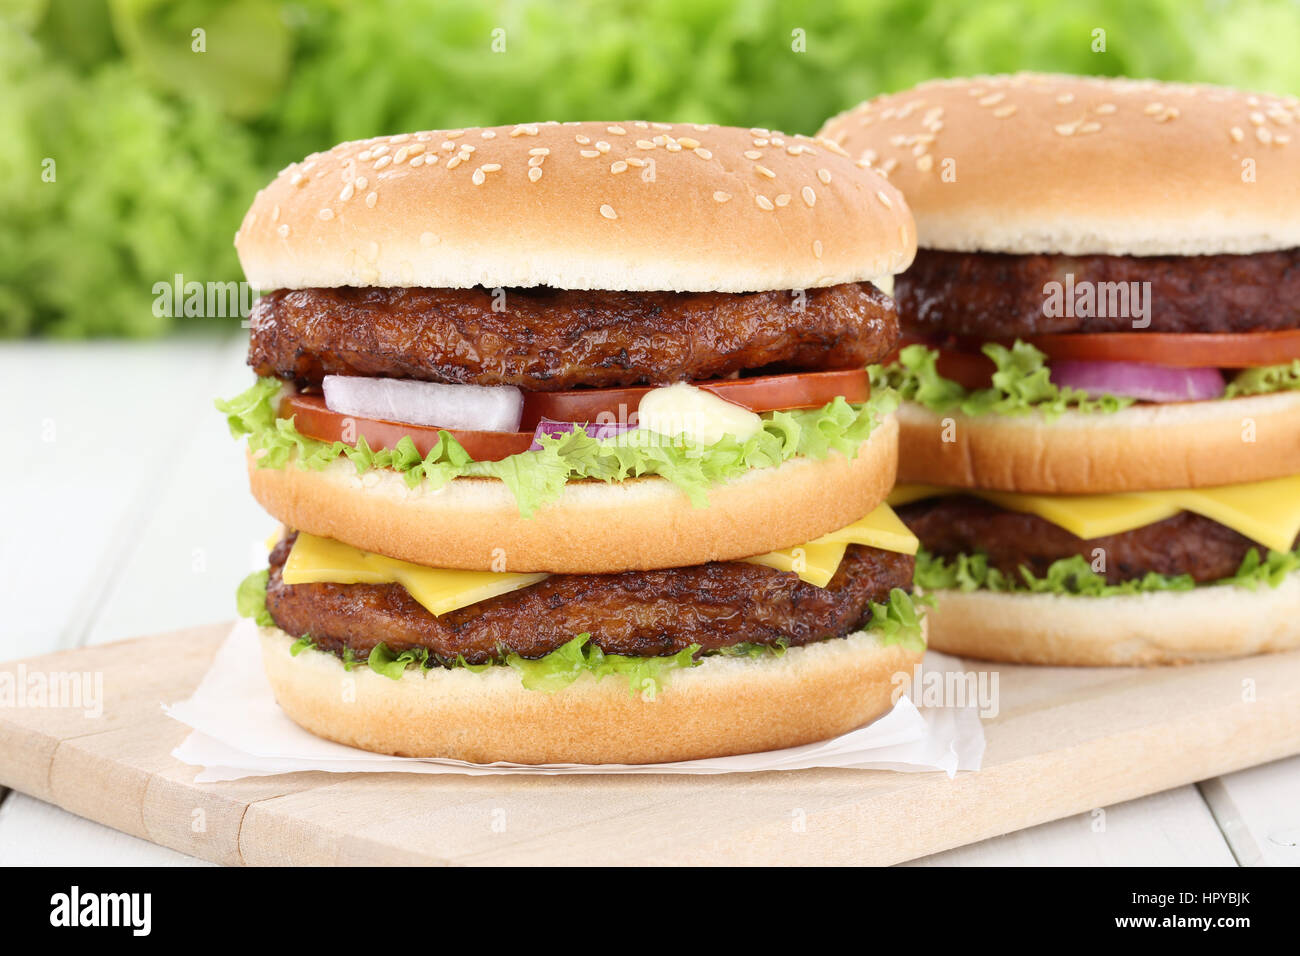 Doppel burger Hamburger Tomaten Käse das ungesunde Essen Stockbild